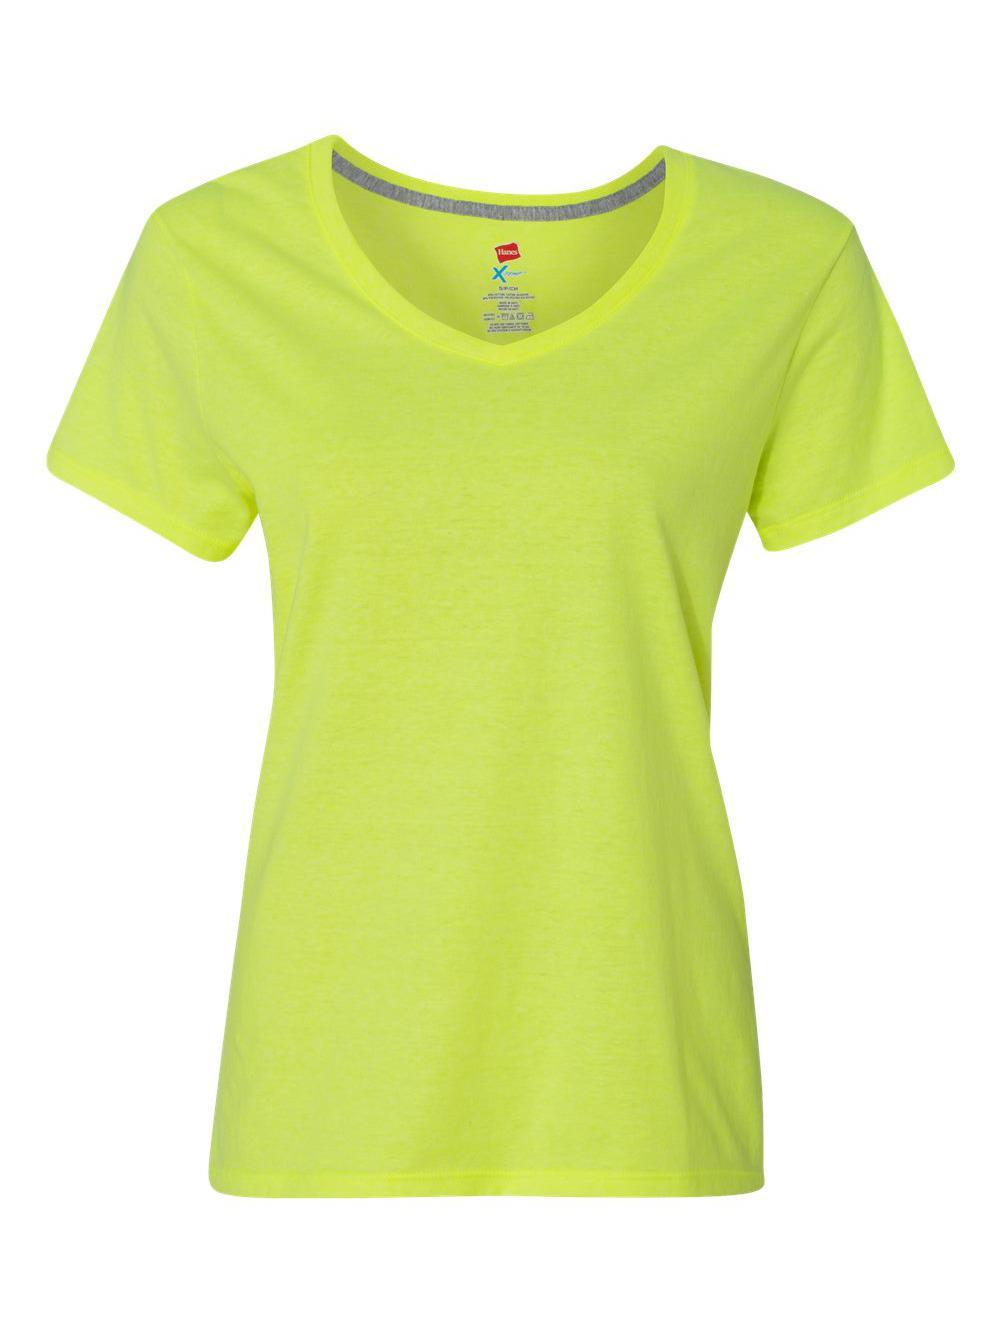 X-Temp Women/'s V-Neck T-Shirt 42V0 Hanes